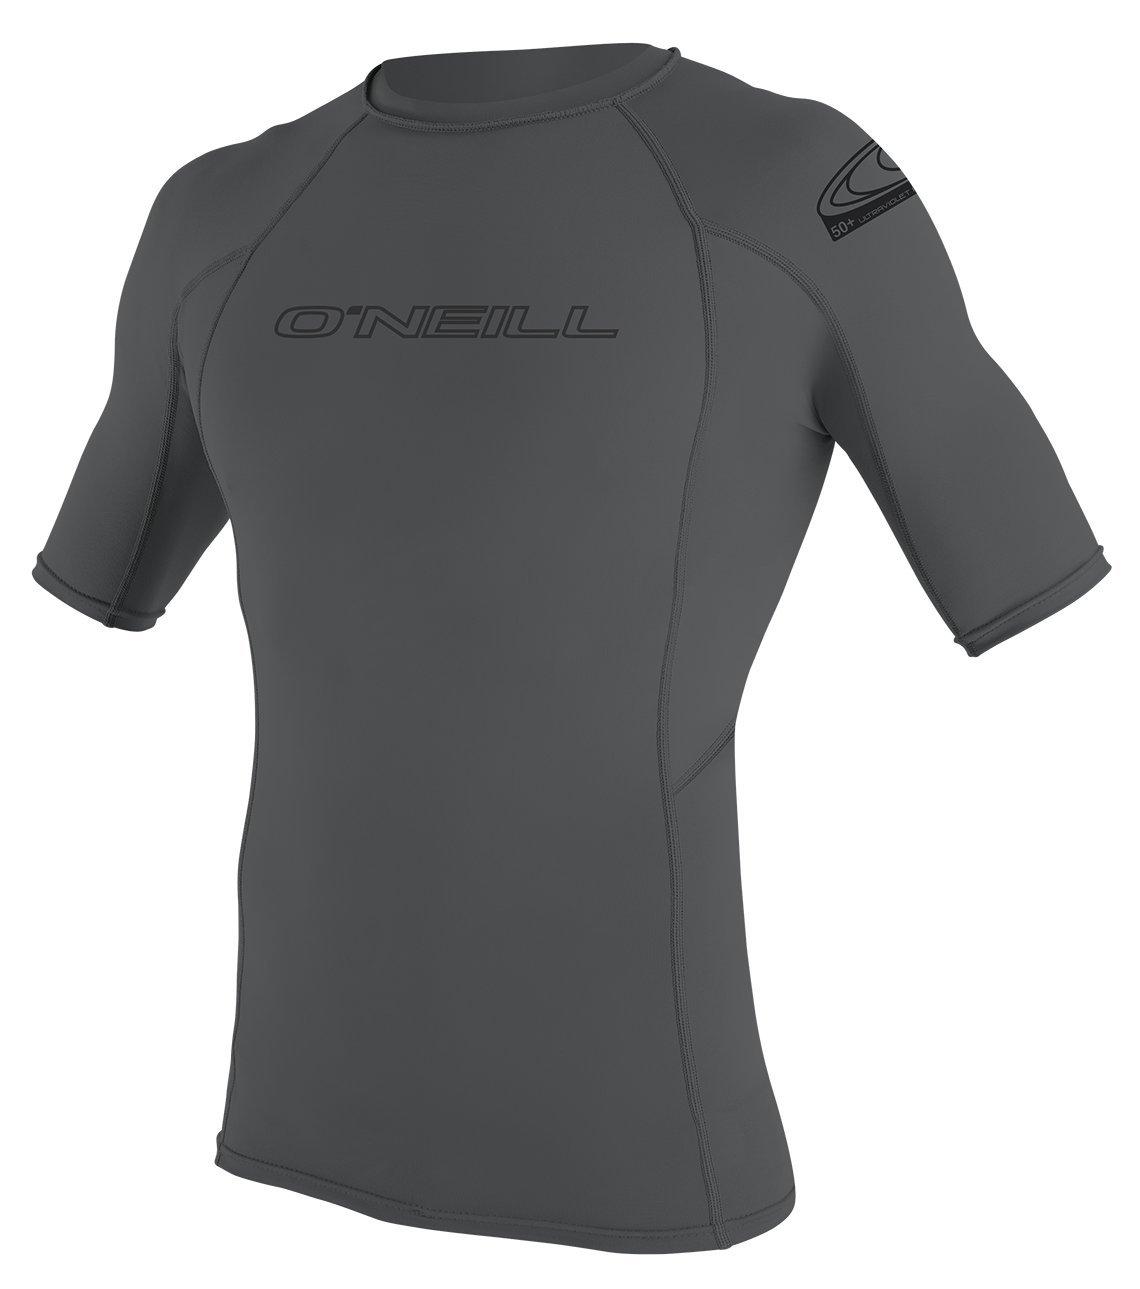 O'Neill Wetsuits Men's Basic Skins UPF 50+ Short Sleeve Rash Guard, Smoke, X-Large